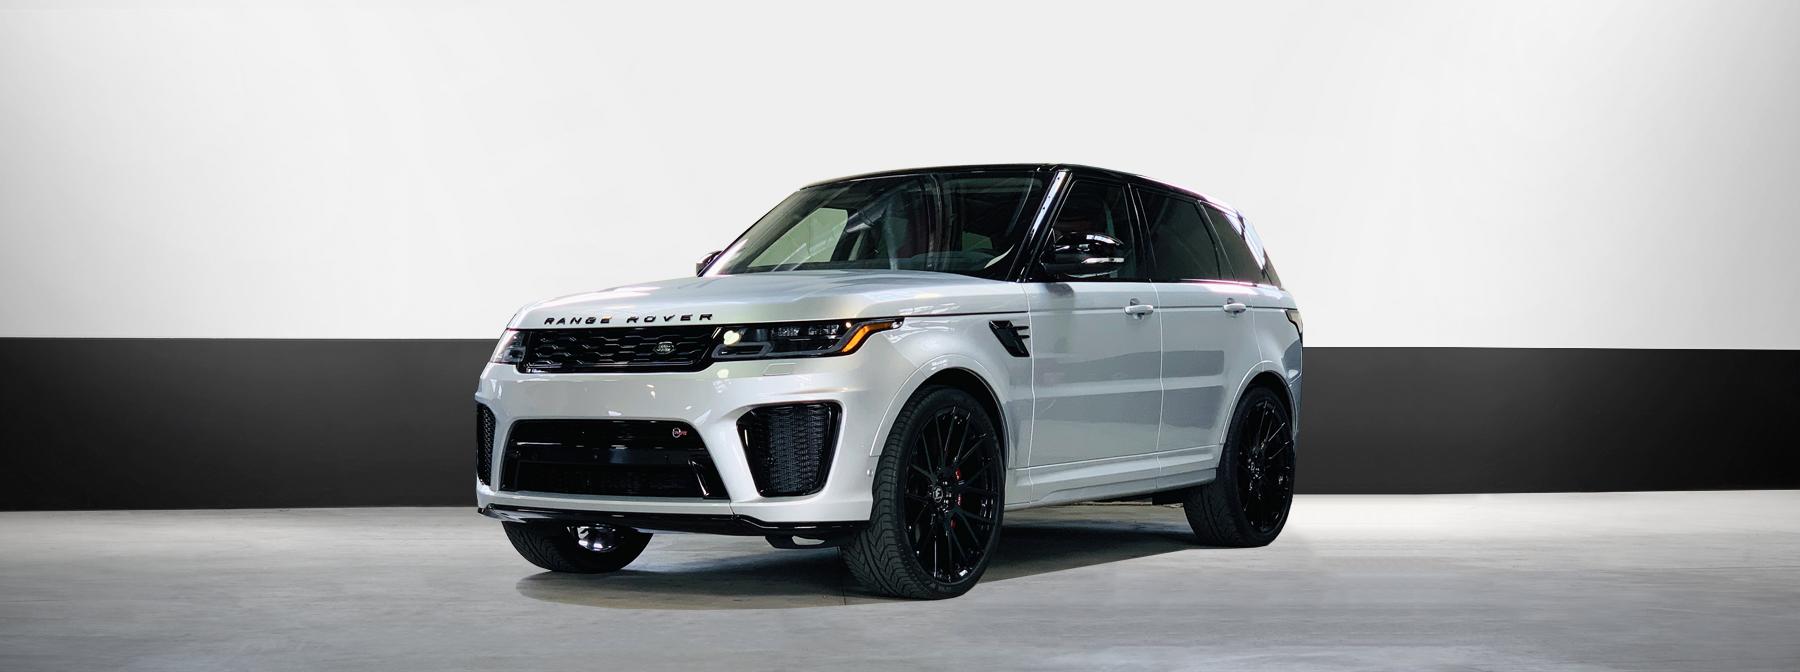 range rover luxury suv rental in silver